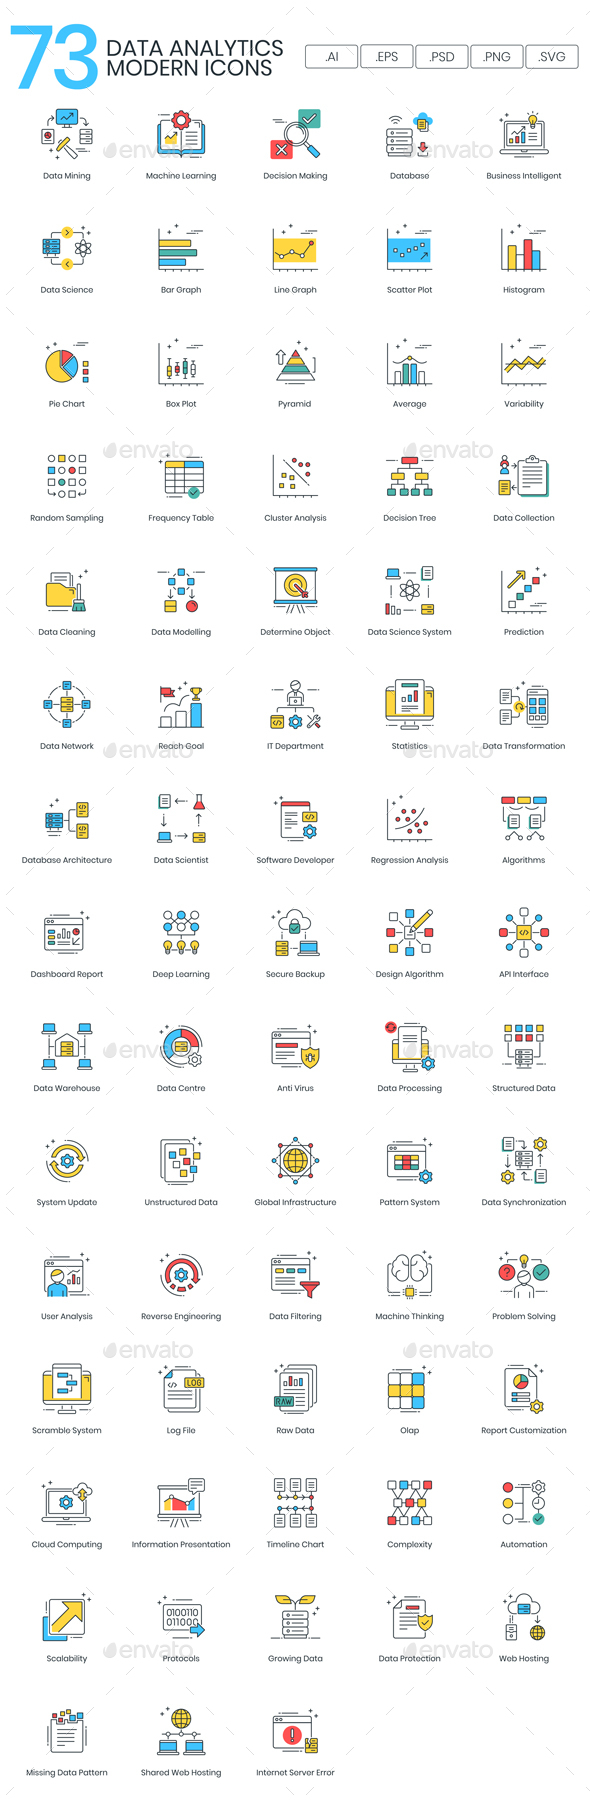 Data Analytics Icons - Modern - Web Icons